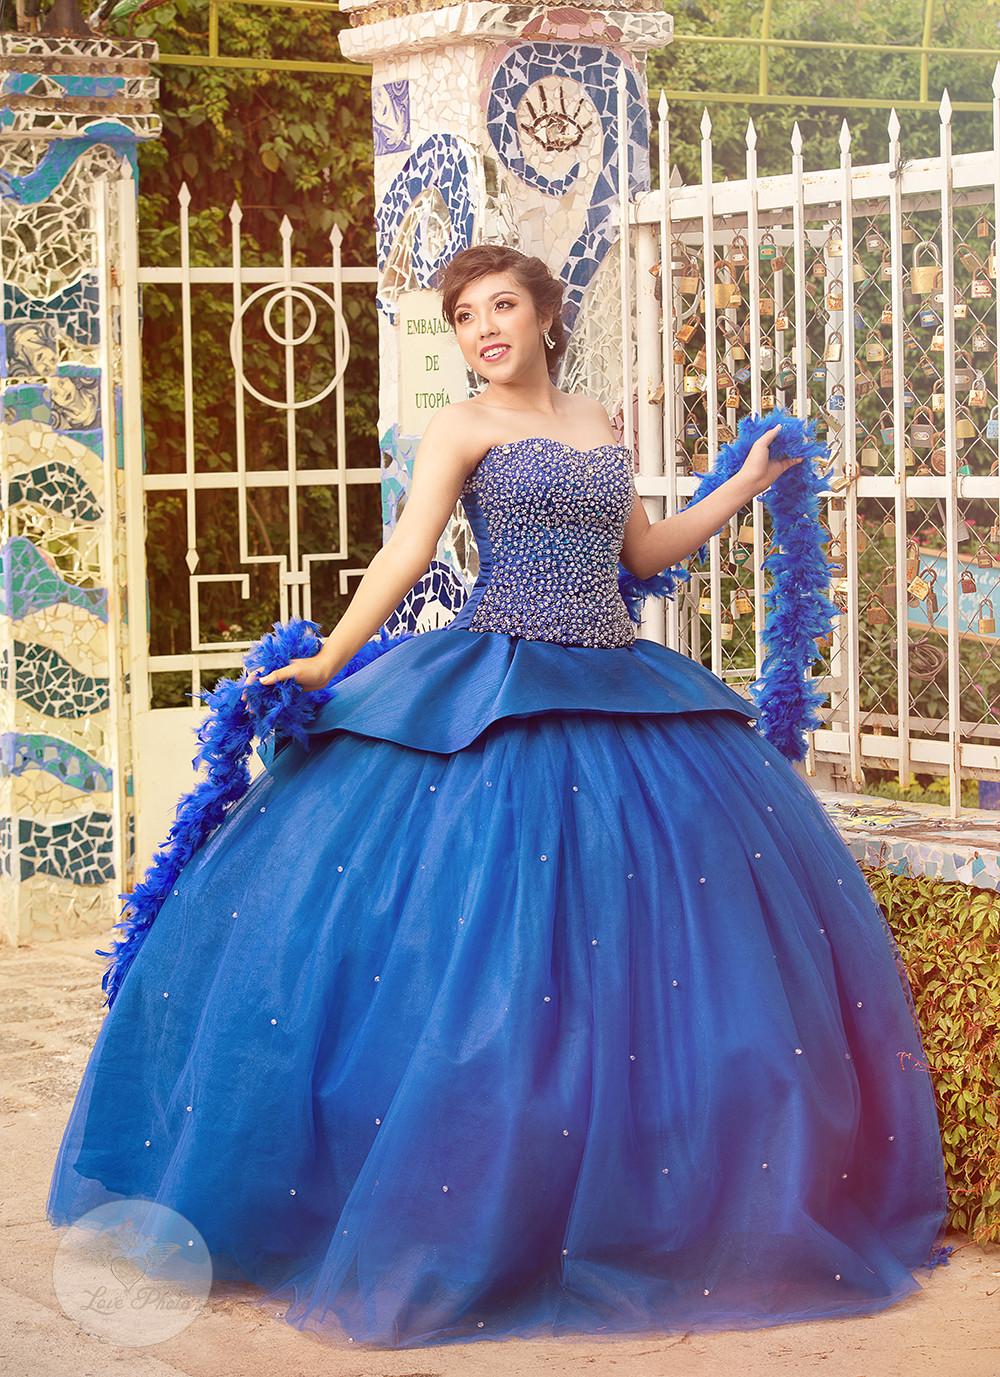 blue-dress-front-losteria(1).jpg